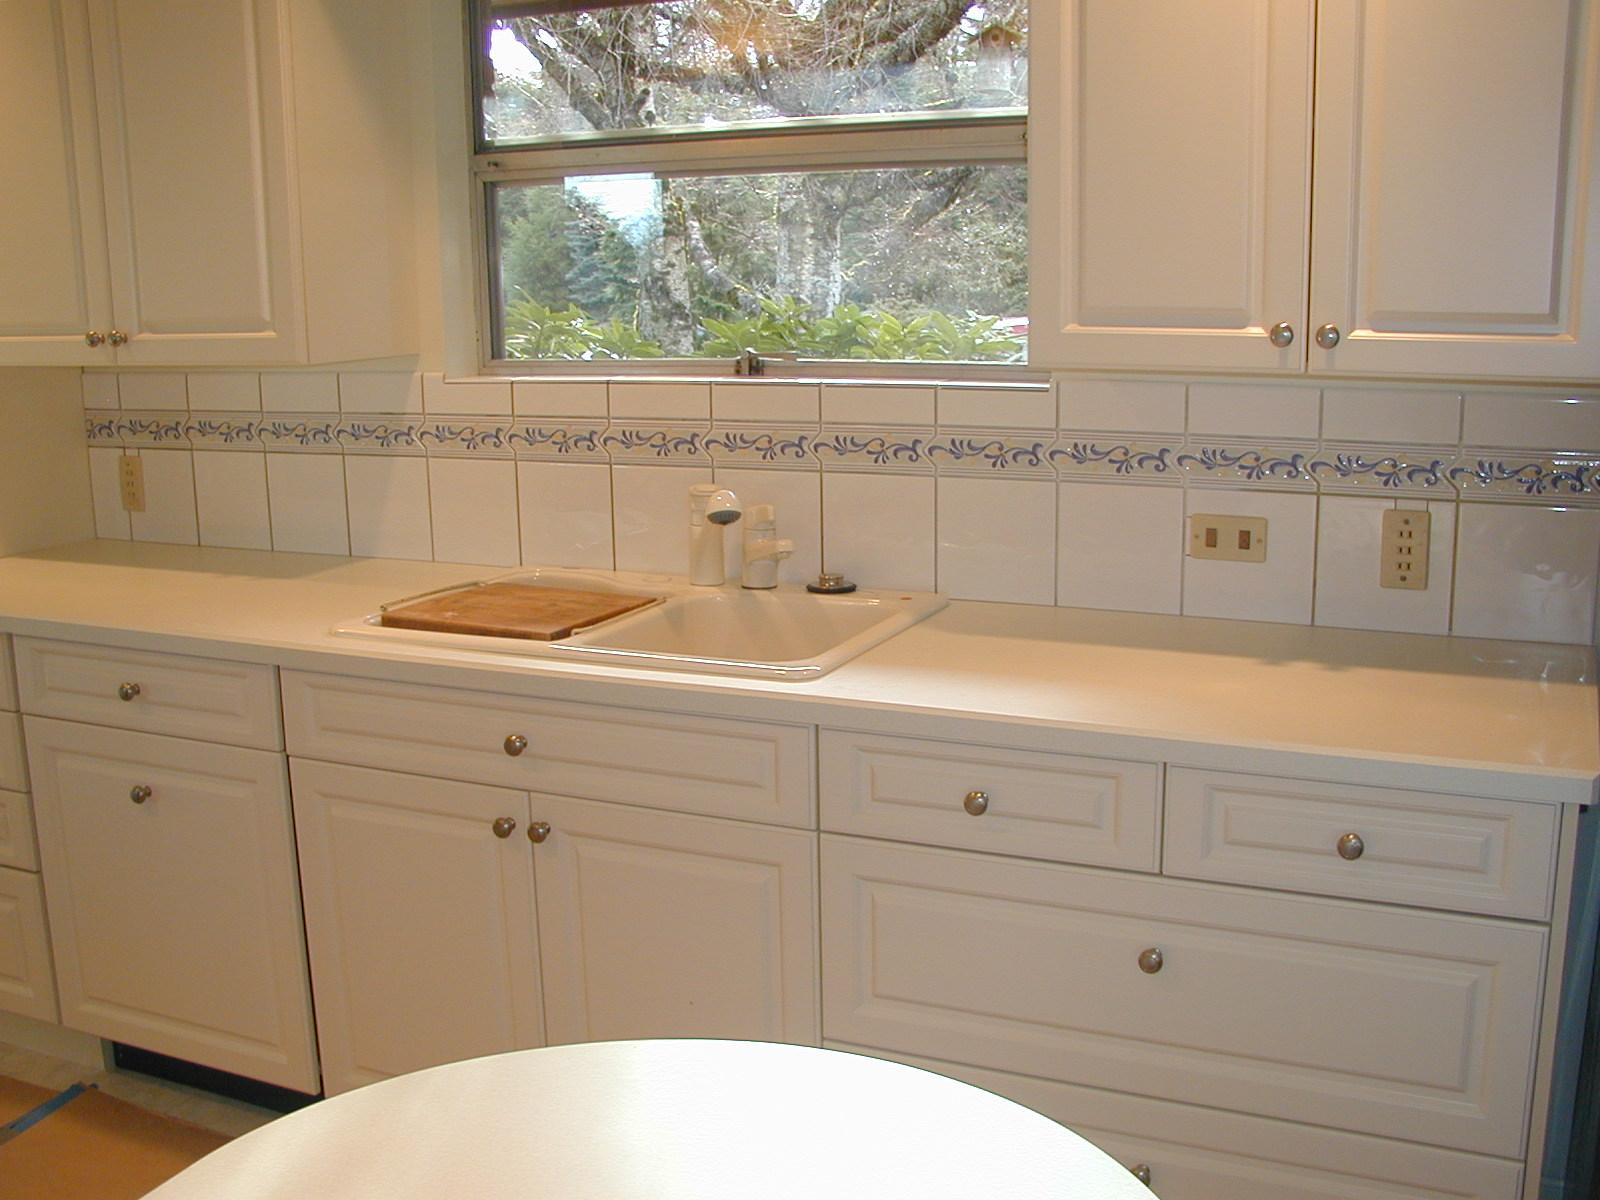 countertop design and installation, laminate kitchen countertop ...